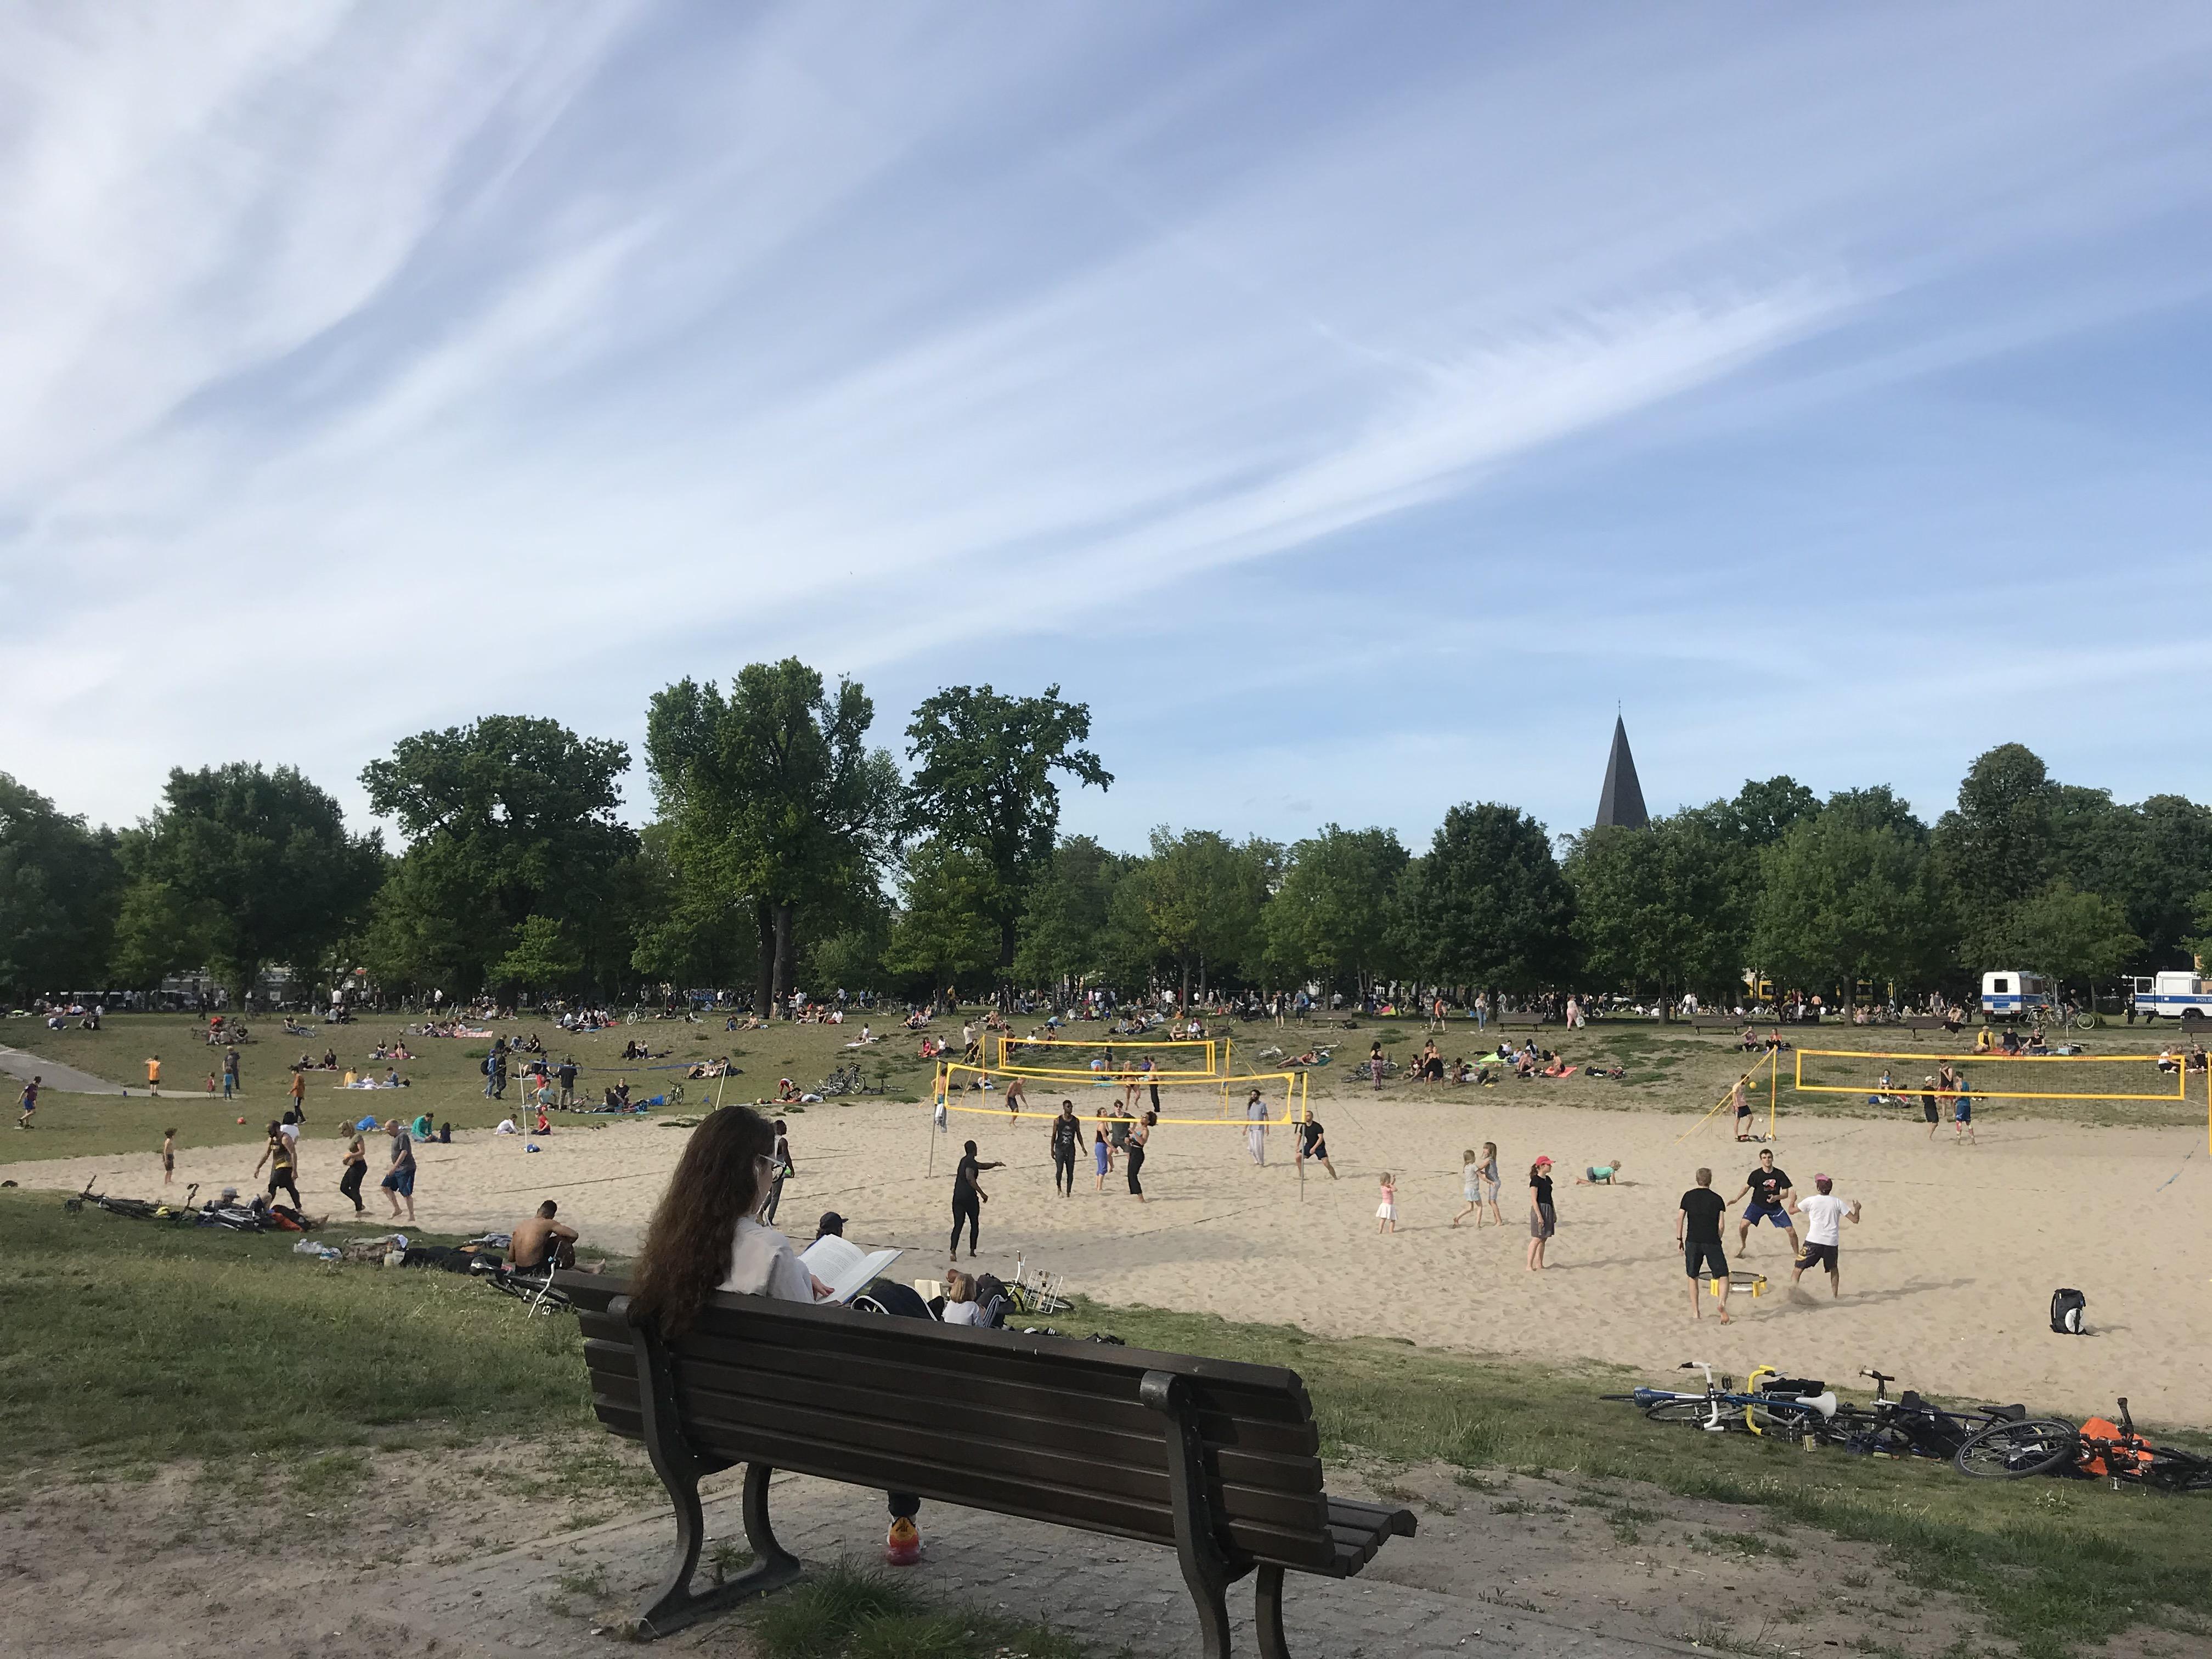 leggere-beach-volley-volkspark-friedrichshain